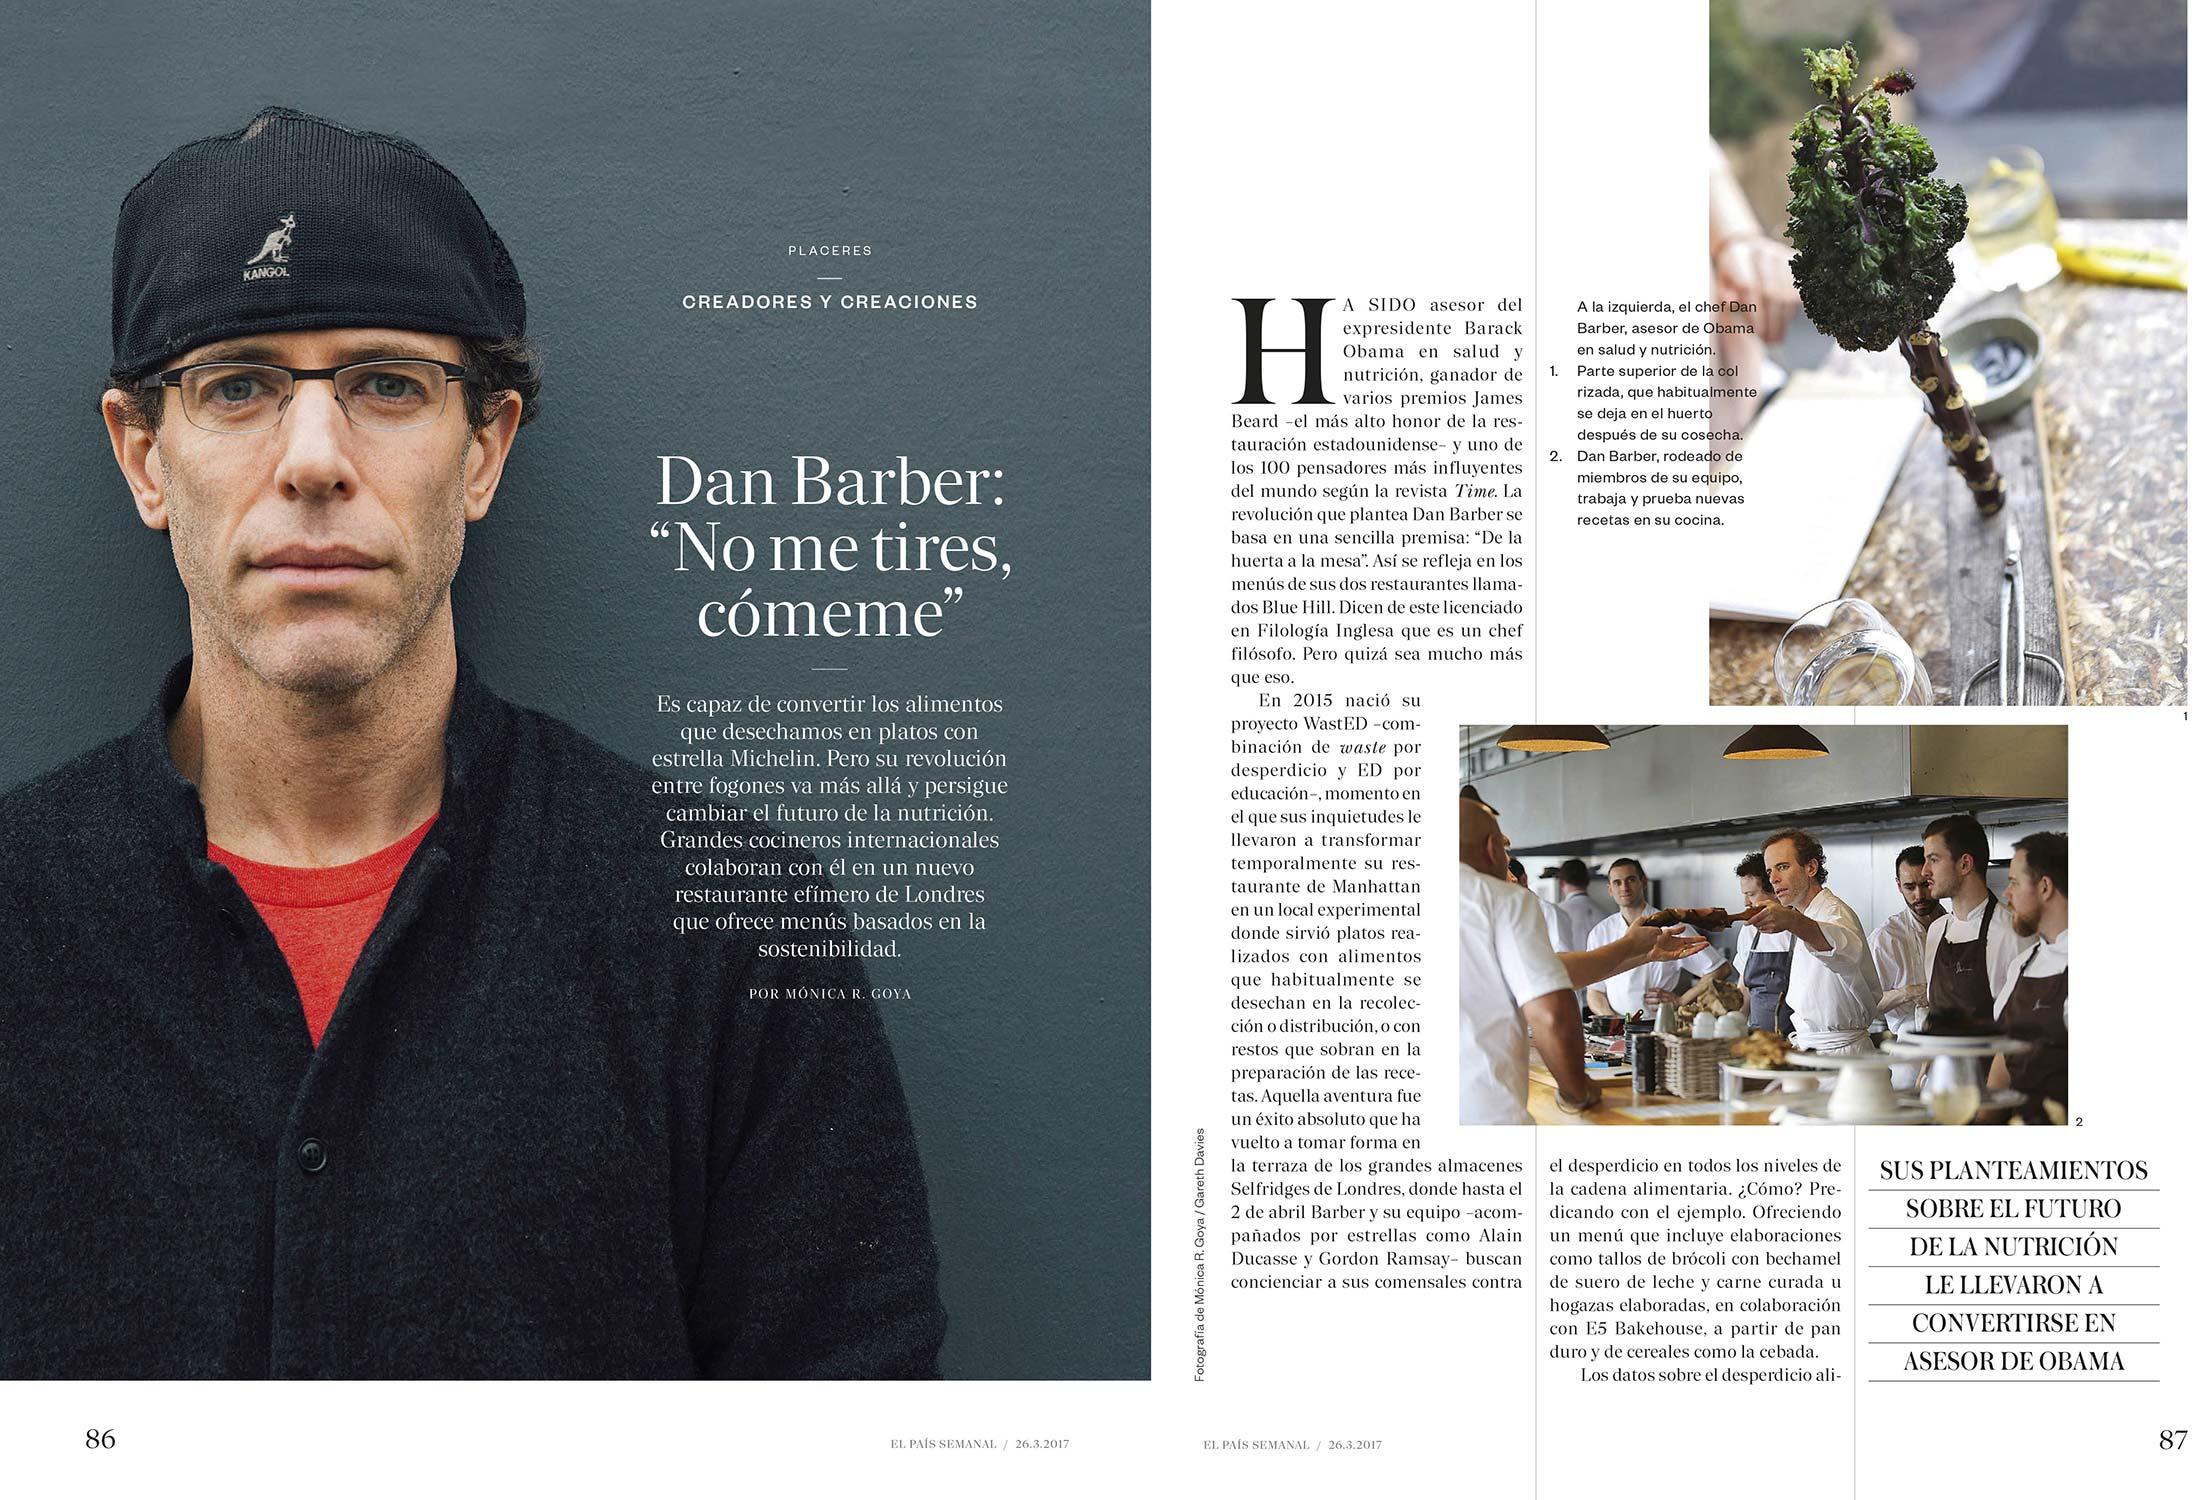 Dan Barber - El País Semanal 26/03/2017 - Words & Photography